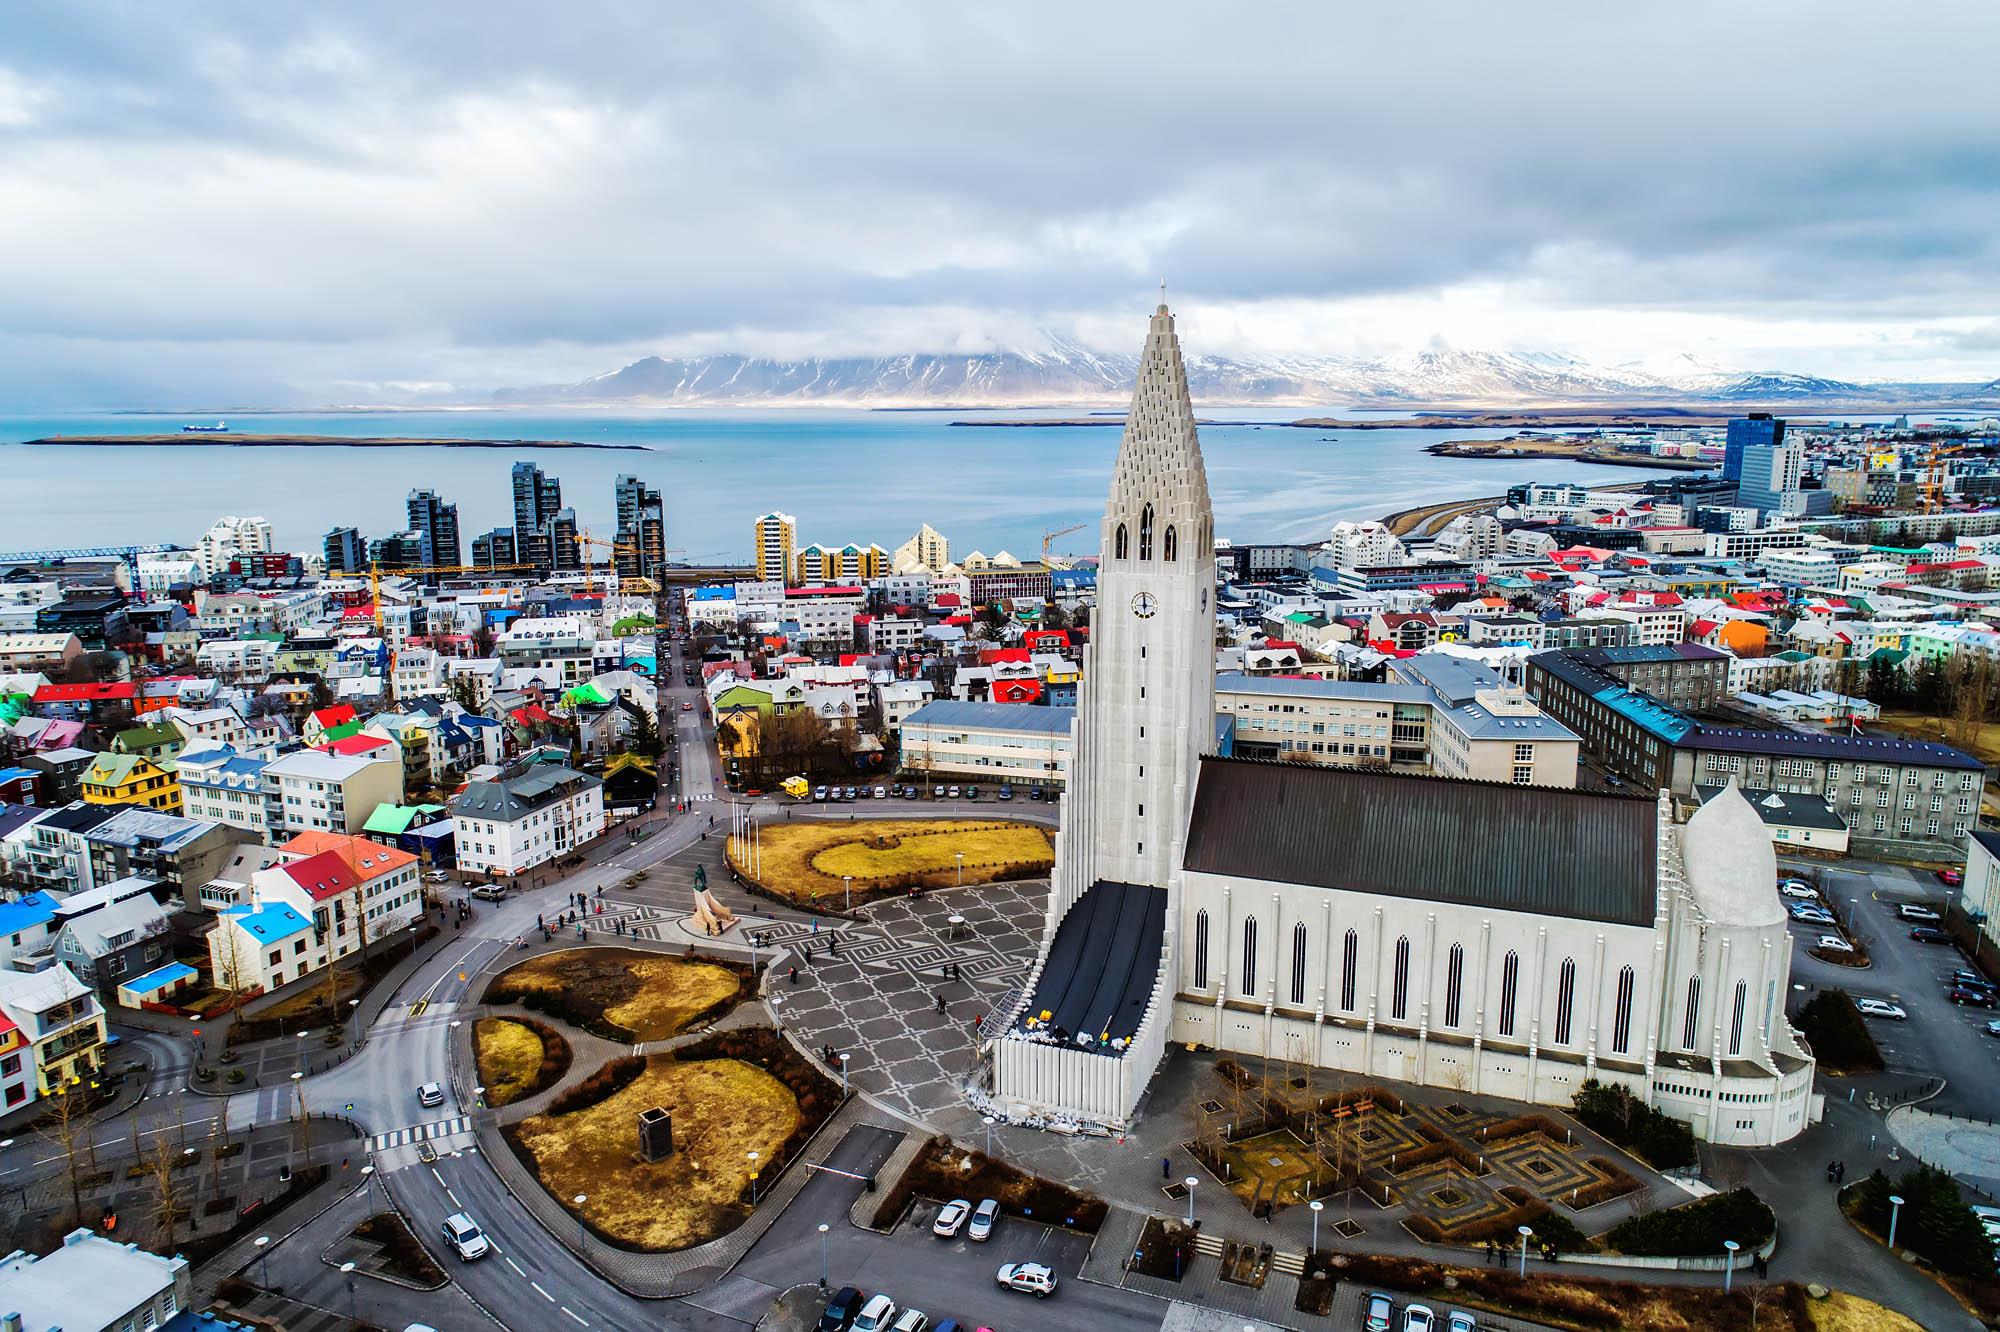 Hallgrimskirkja in Reyjkavik